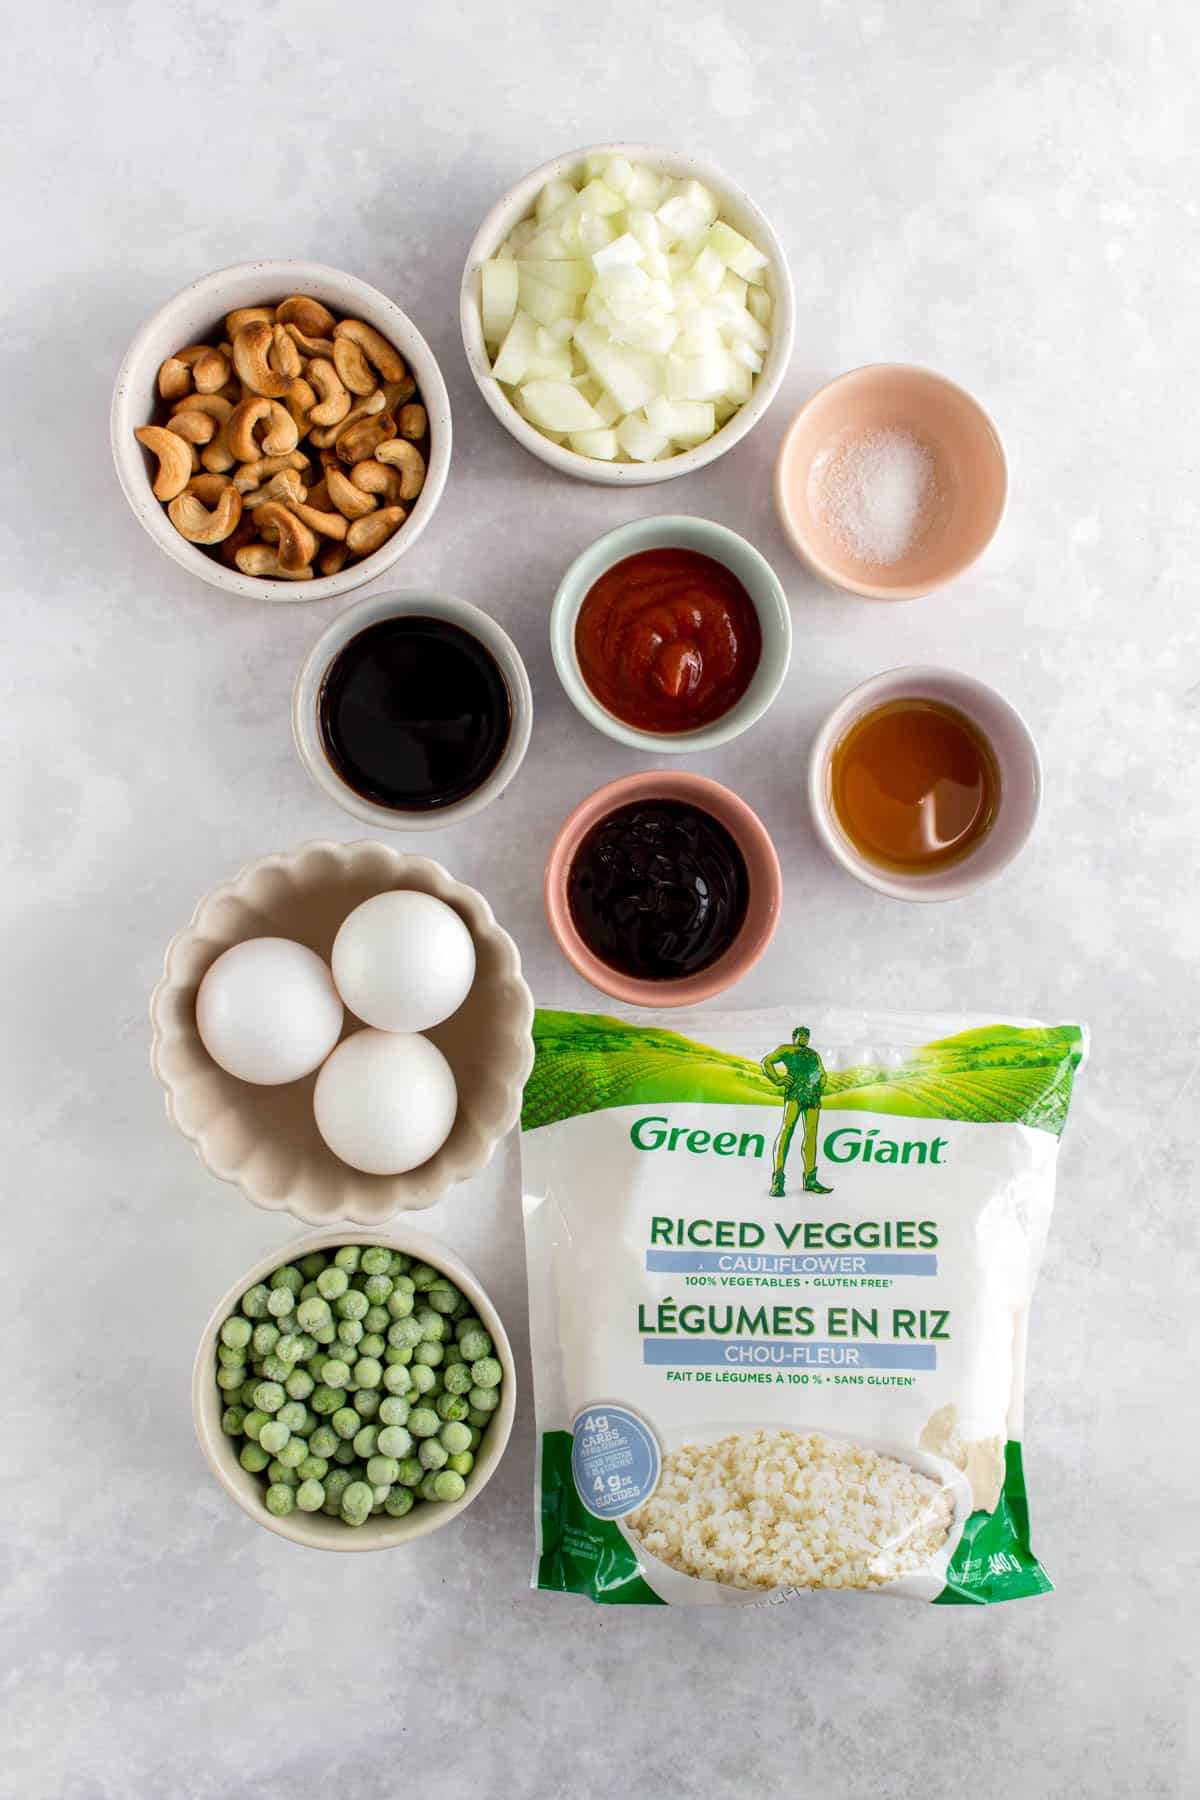 Ingredients for cauliflower fried rice.